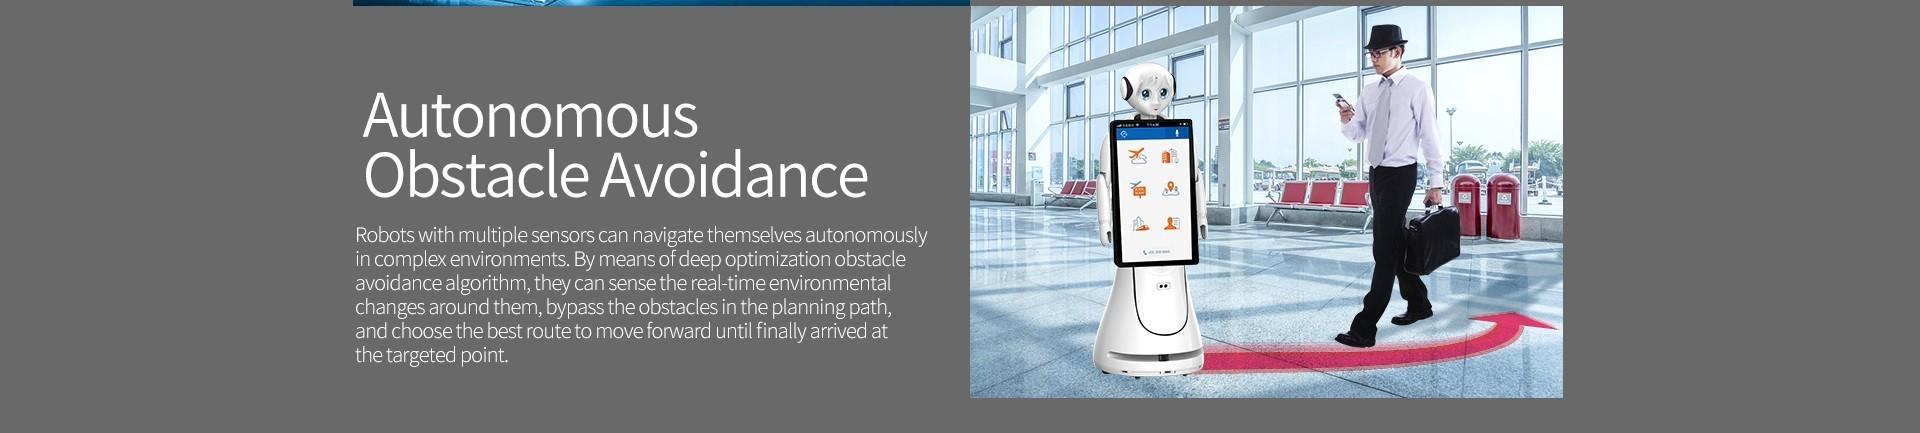 Intelligent Humanoid Reception Telepresence Robot SIFROBOT-5.0 autonomous obstacle avoidance